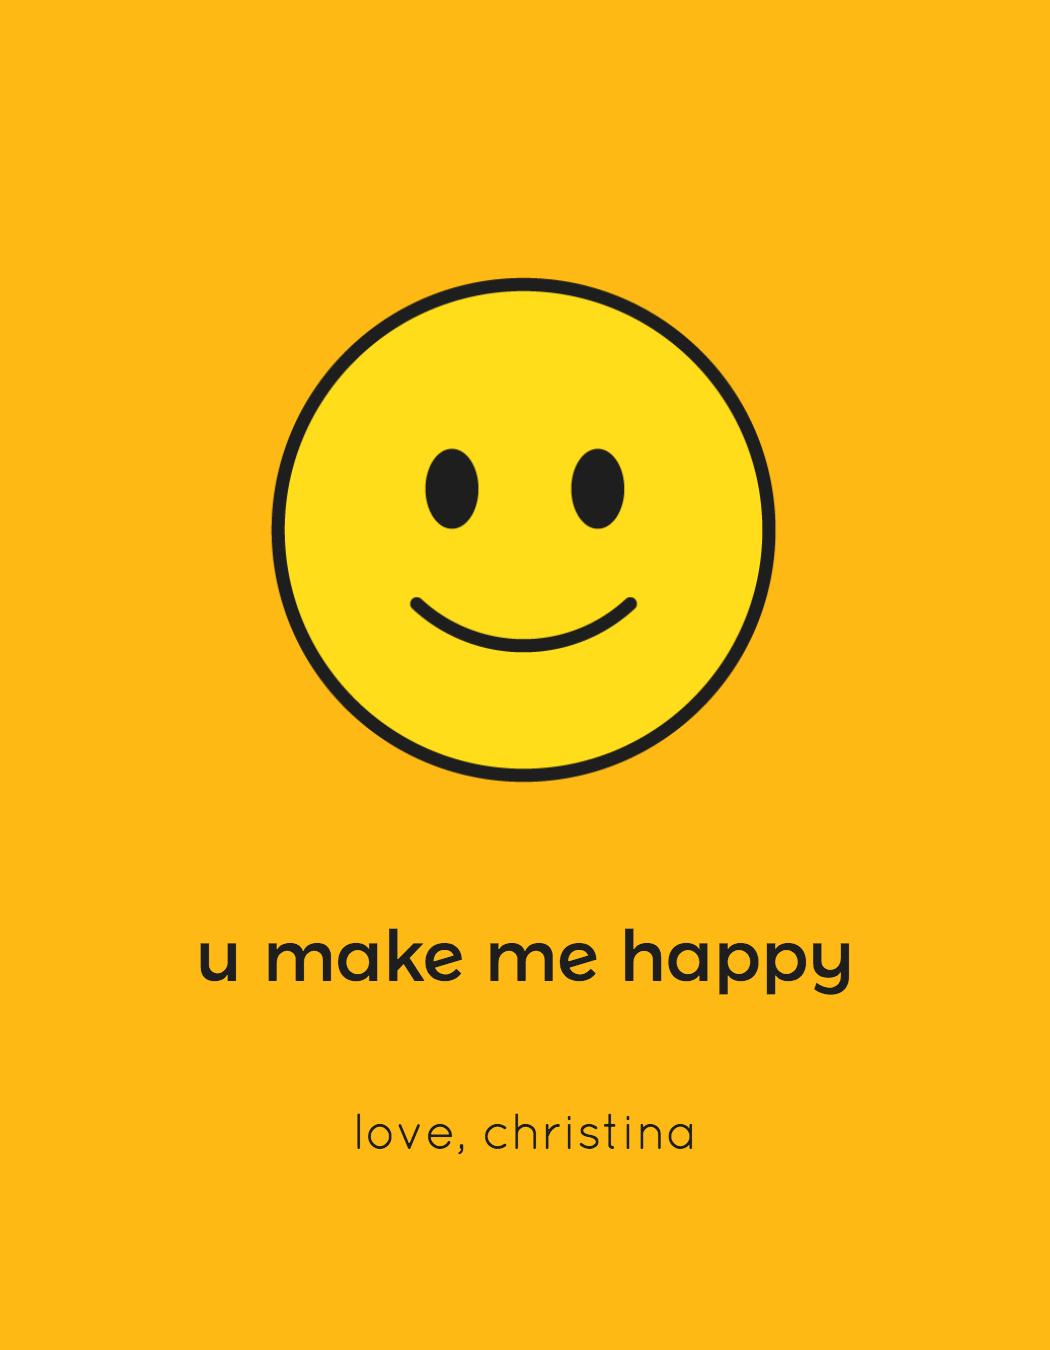 wine label with a happy emoji